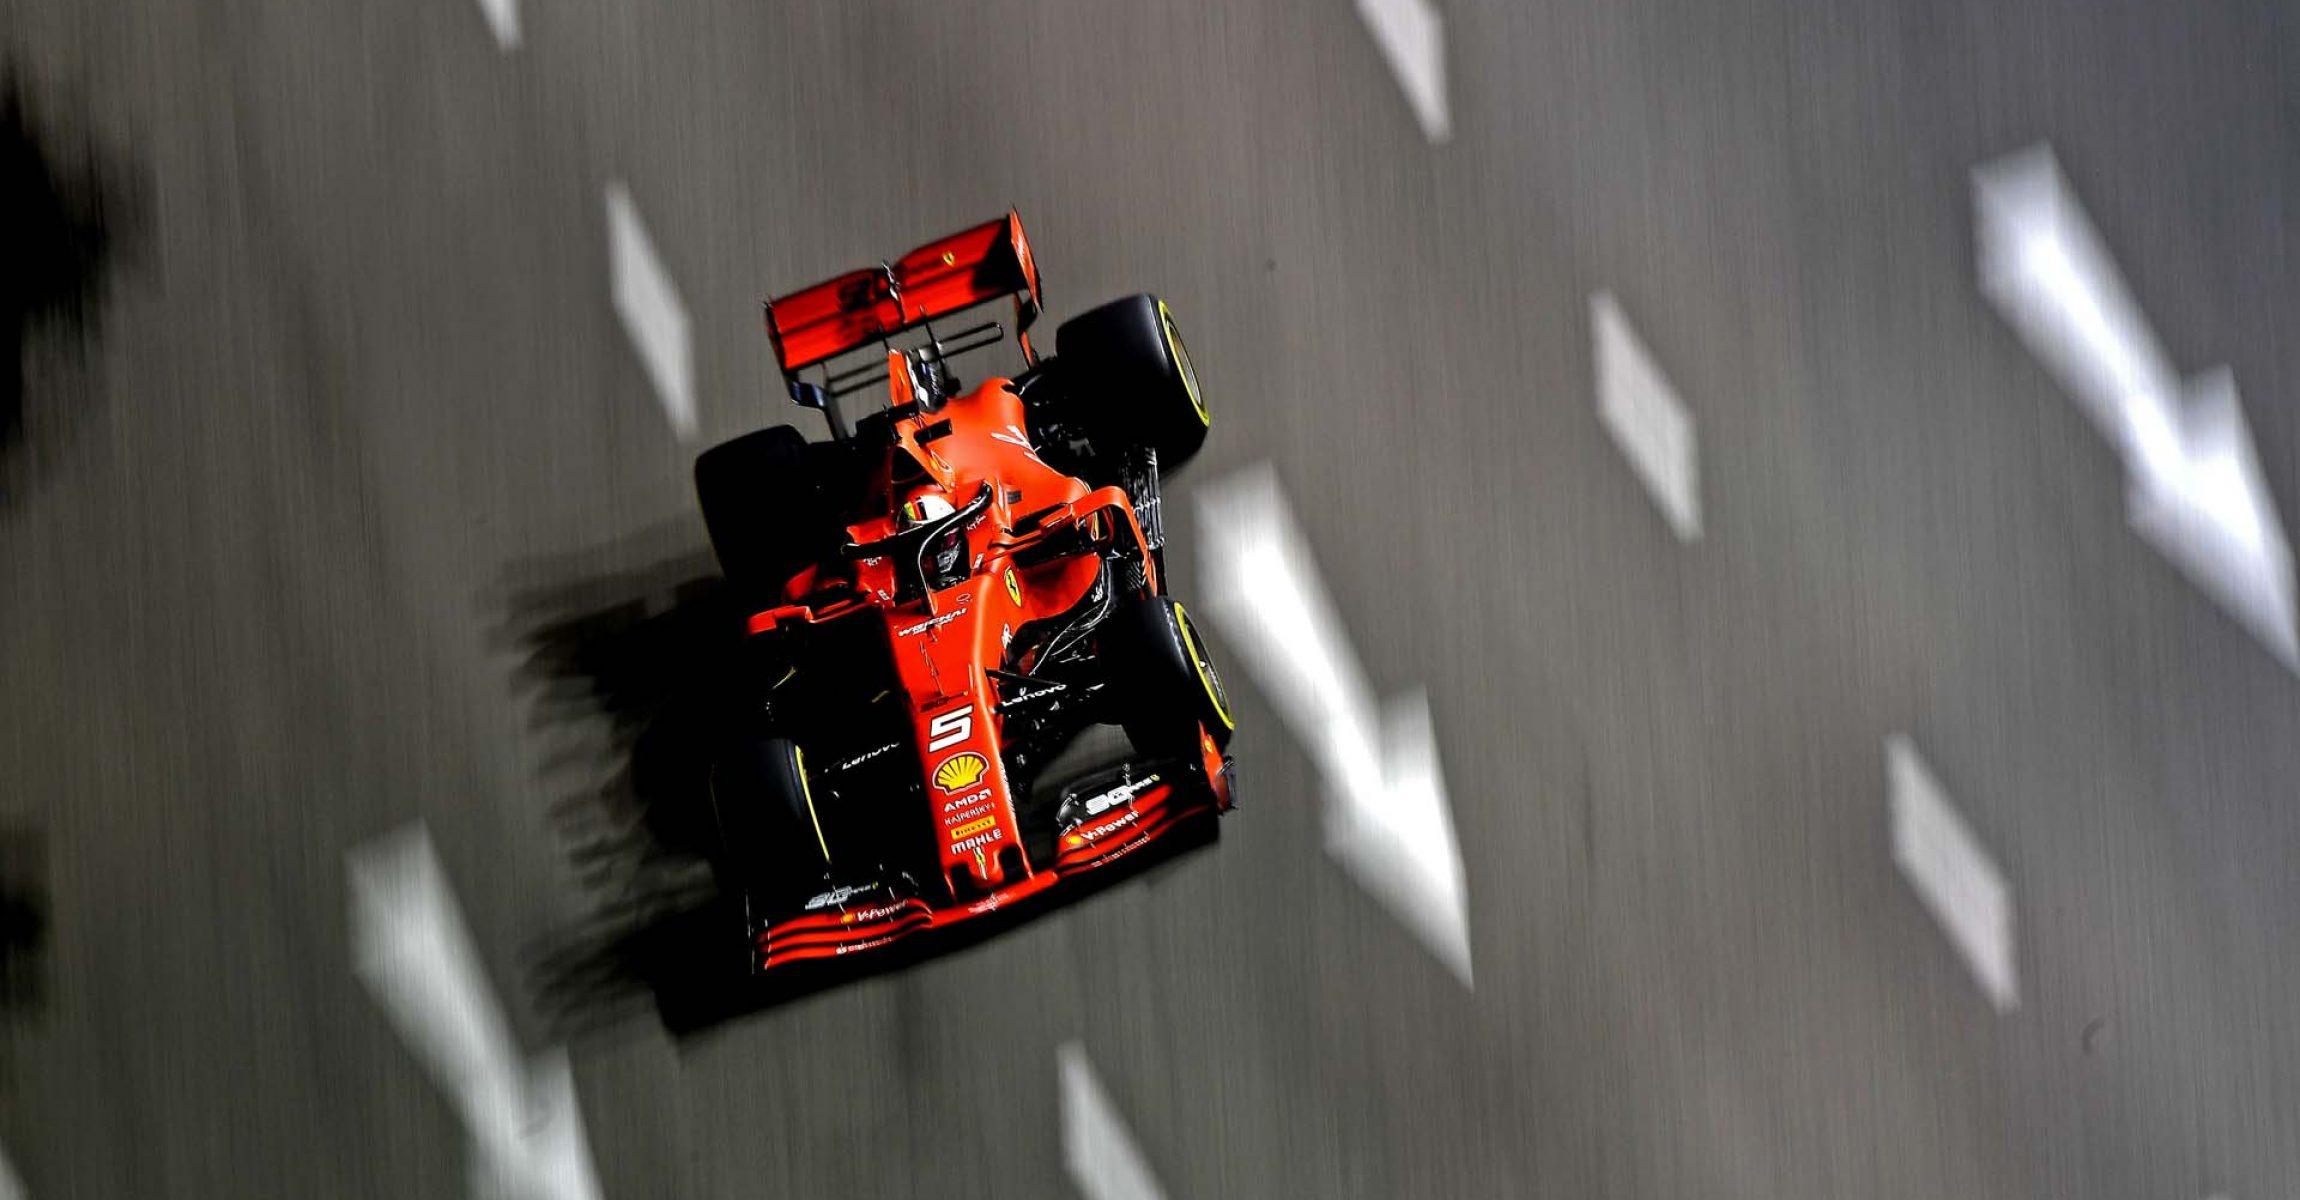 GP SINGAPORE F1/2019 -  VENERDI 20/09/2019   credit: @Scuderia Ferrari Press Office Sebastian Vettel, Ferrari, Singapore Grand Prix 2019